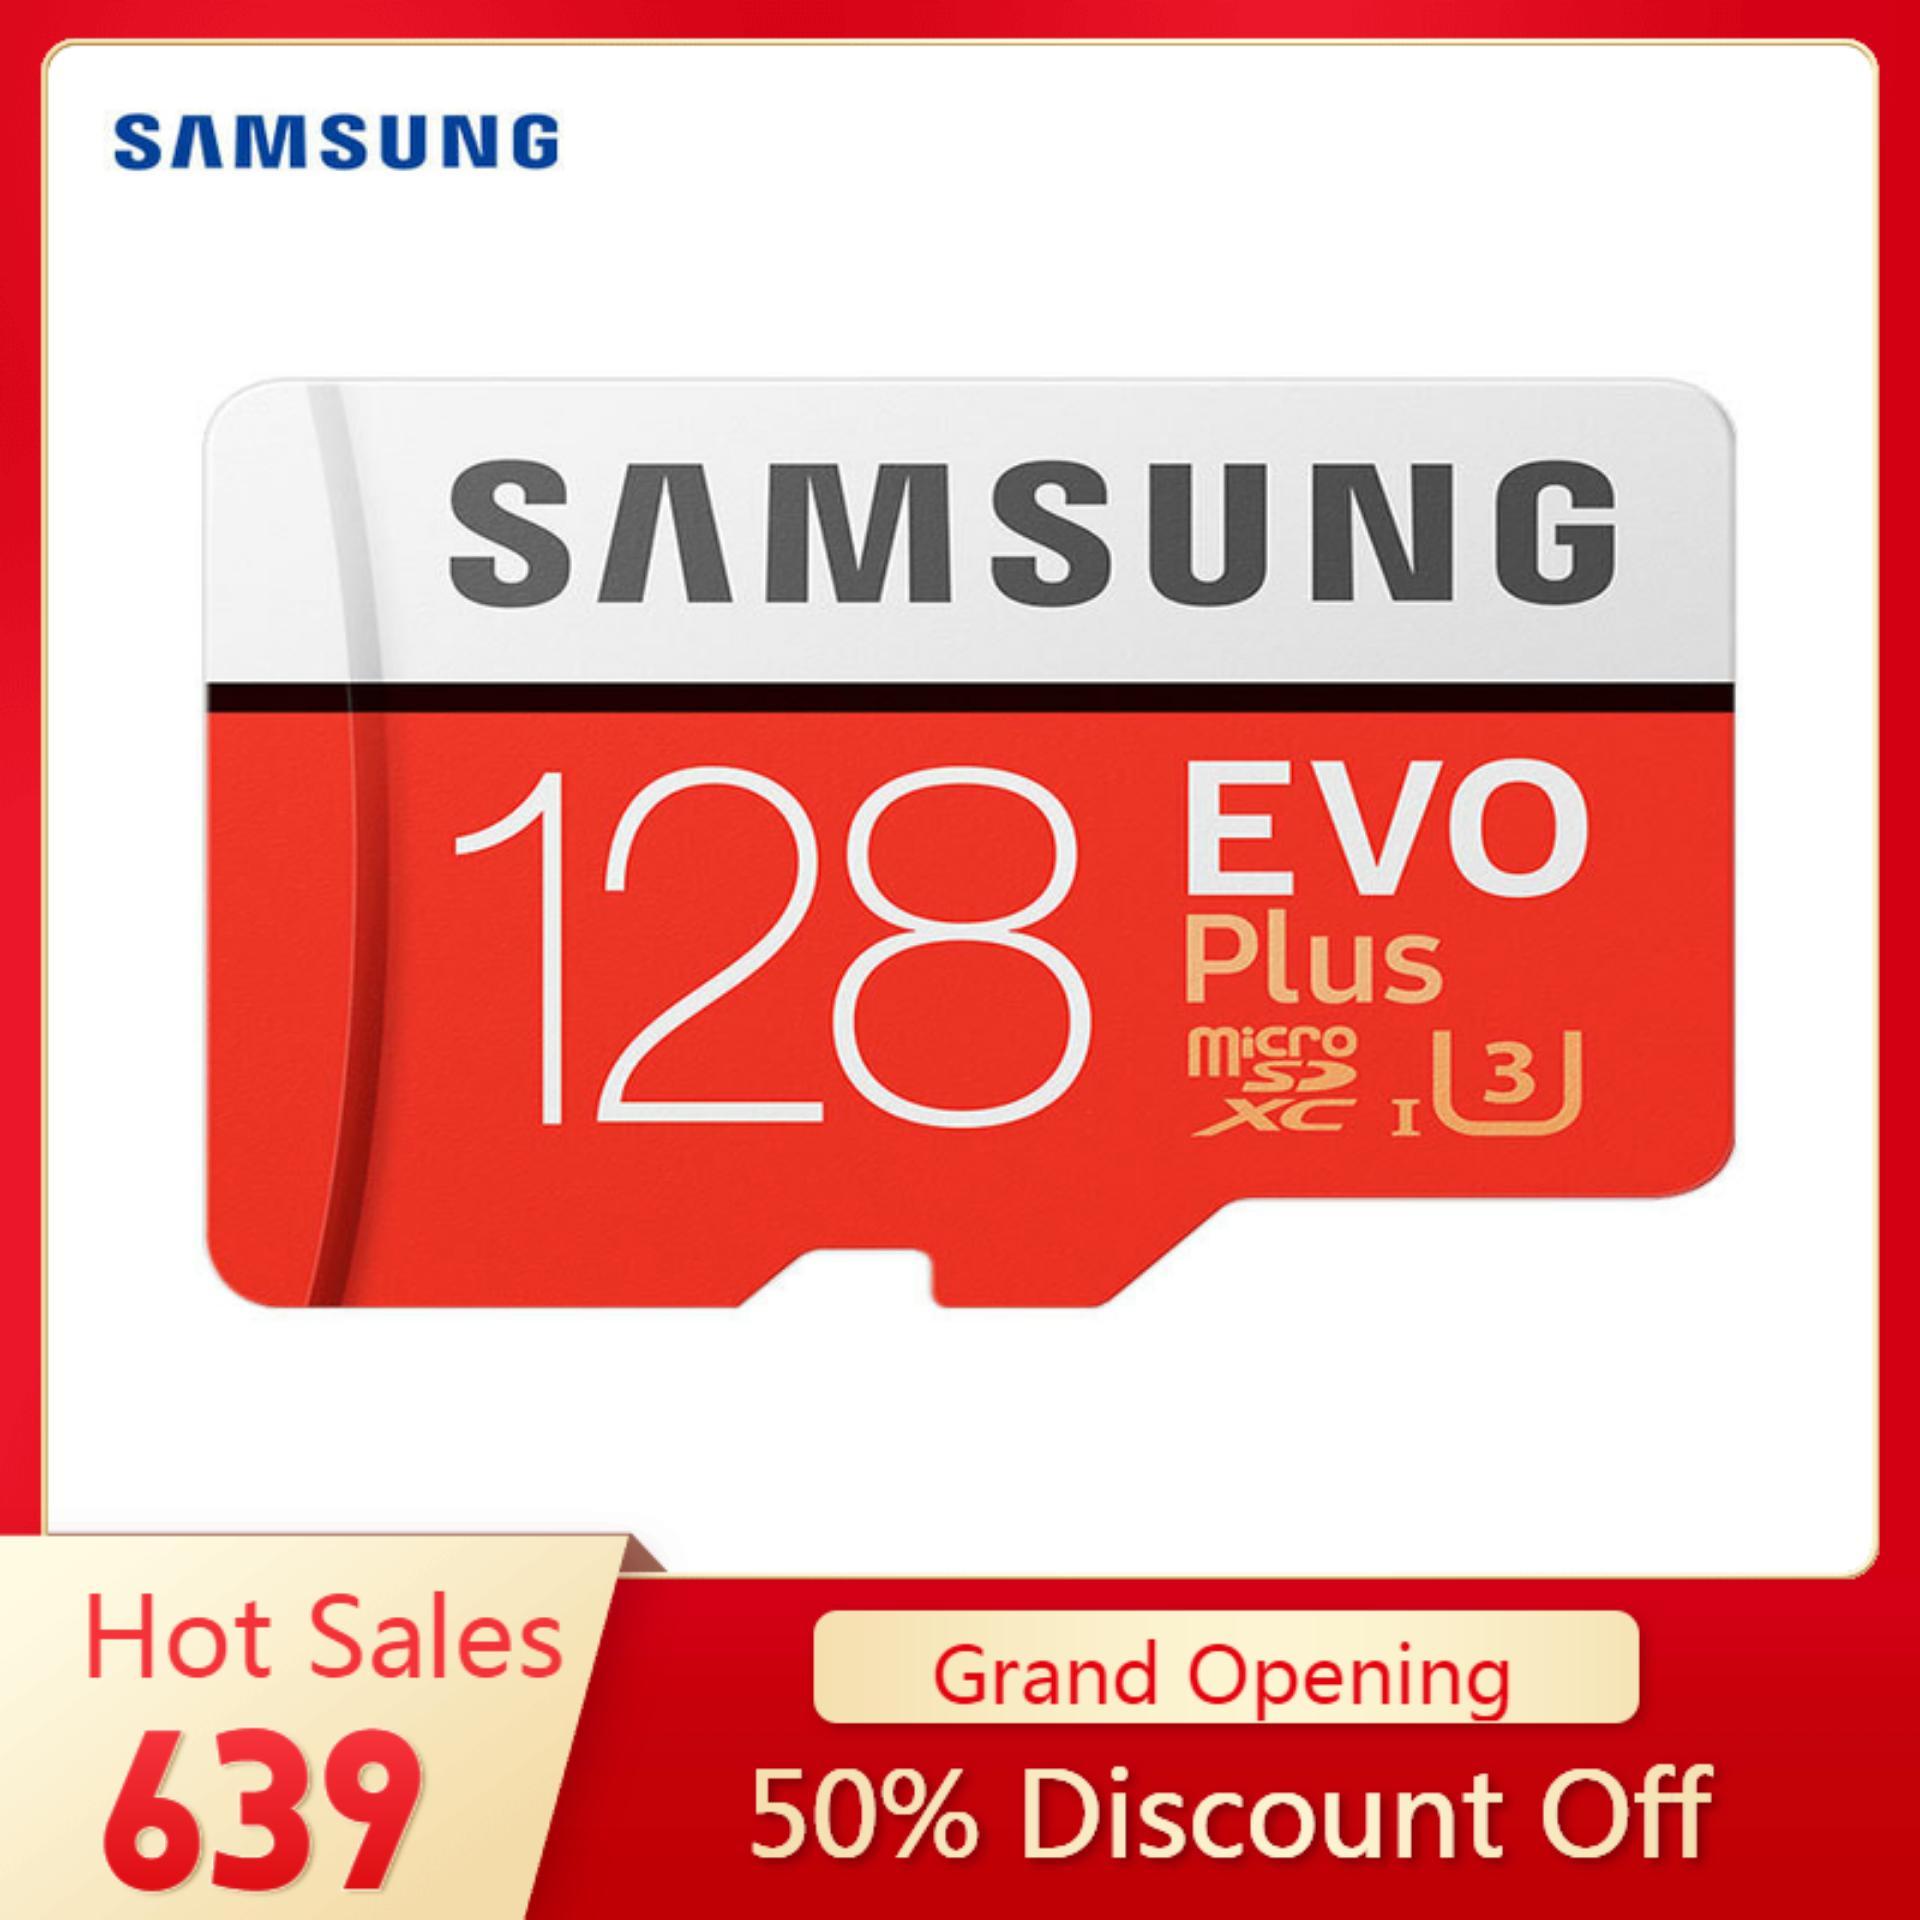 Samsung Philippines - Samsung Camera MicroSD for sale - prices